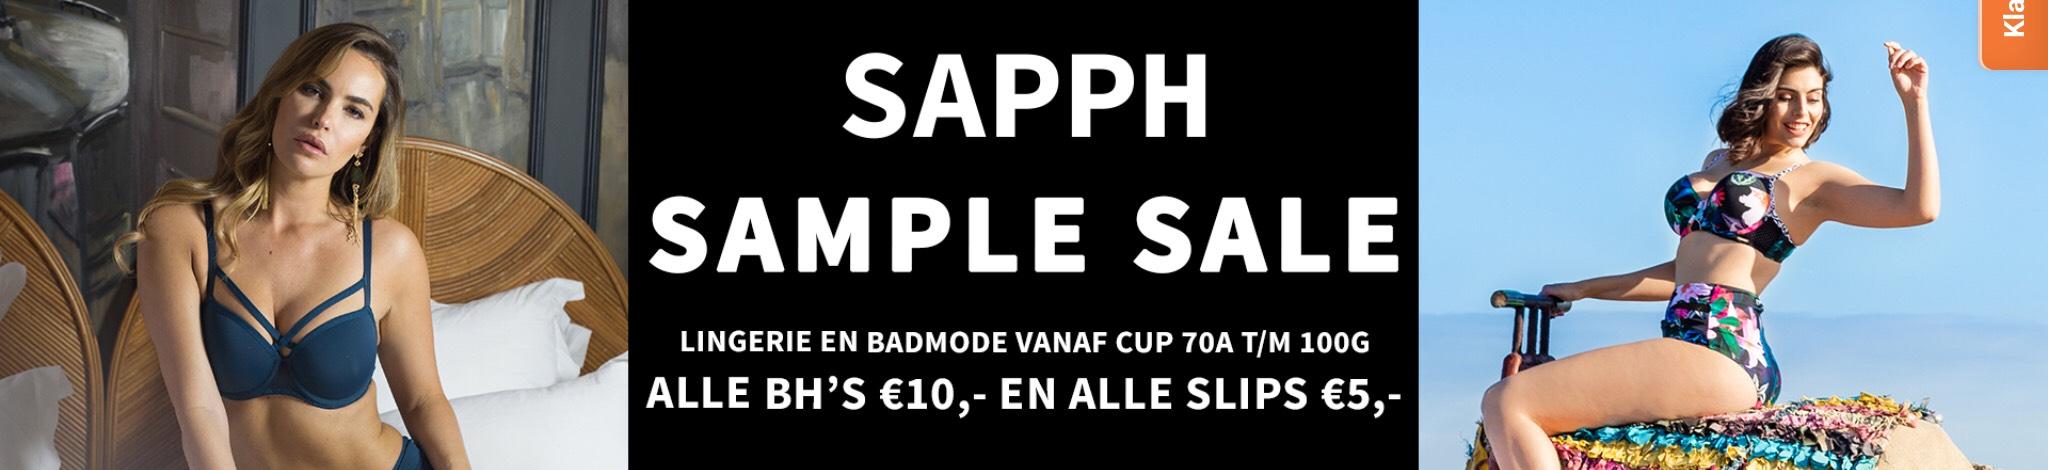 Sapph Sample Sale